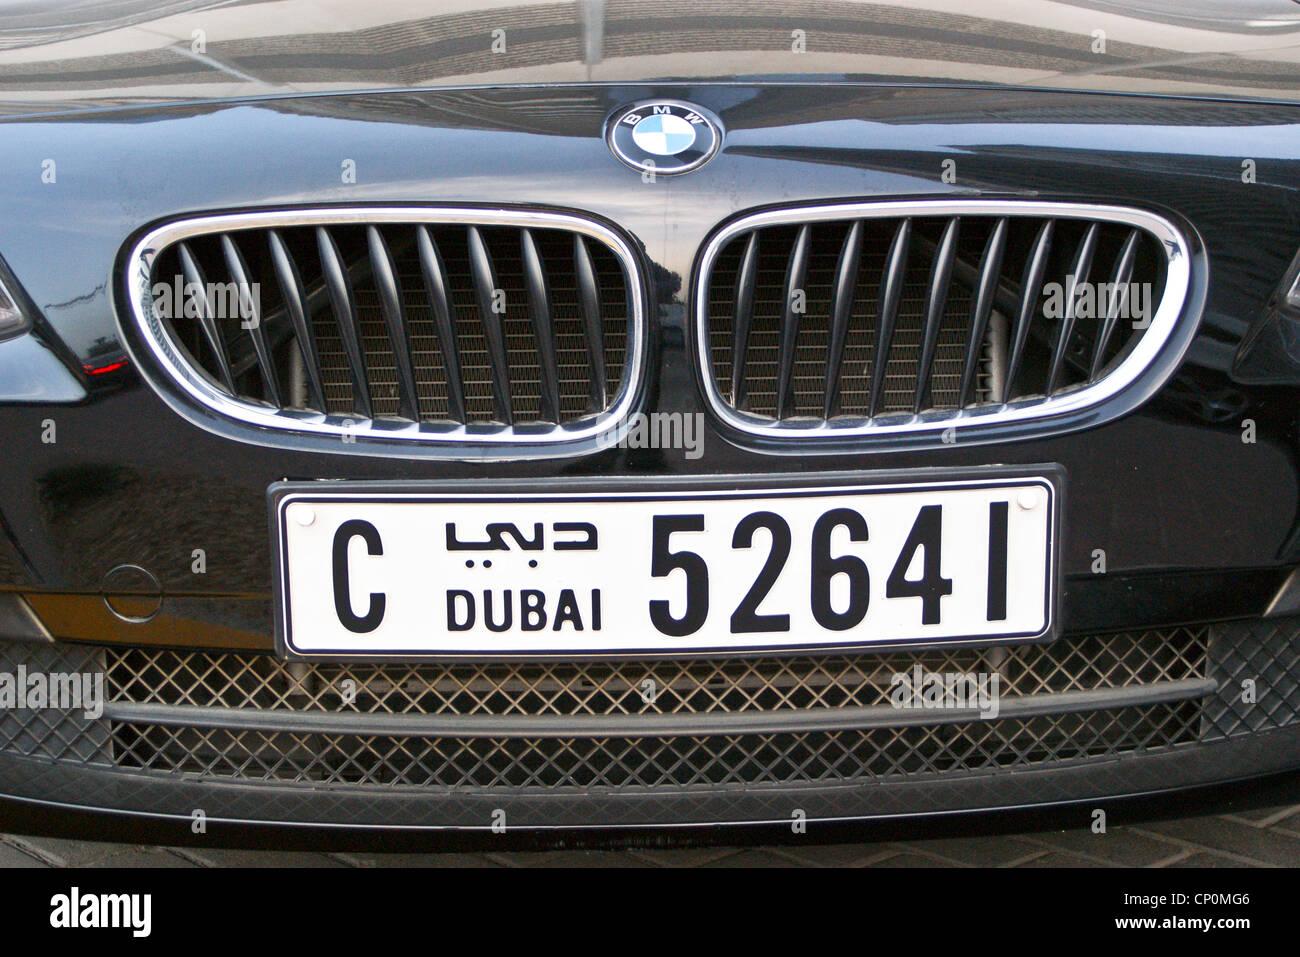 a-bmw-with-dubai-number-plates-dubai-united-arab-emirates-CP0MG6.jpg